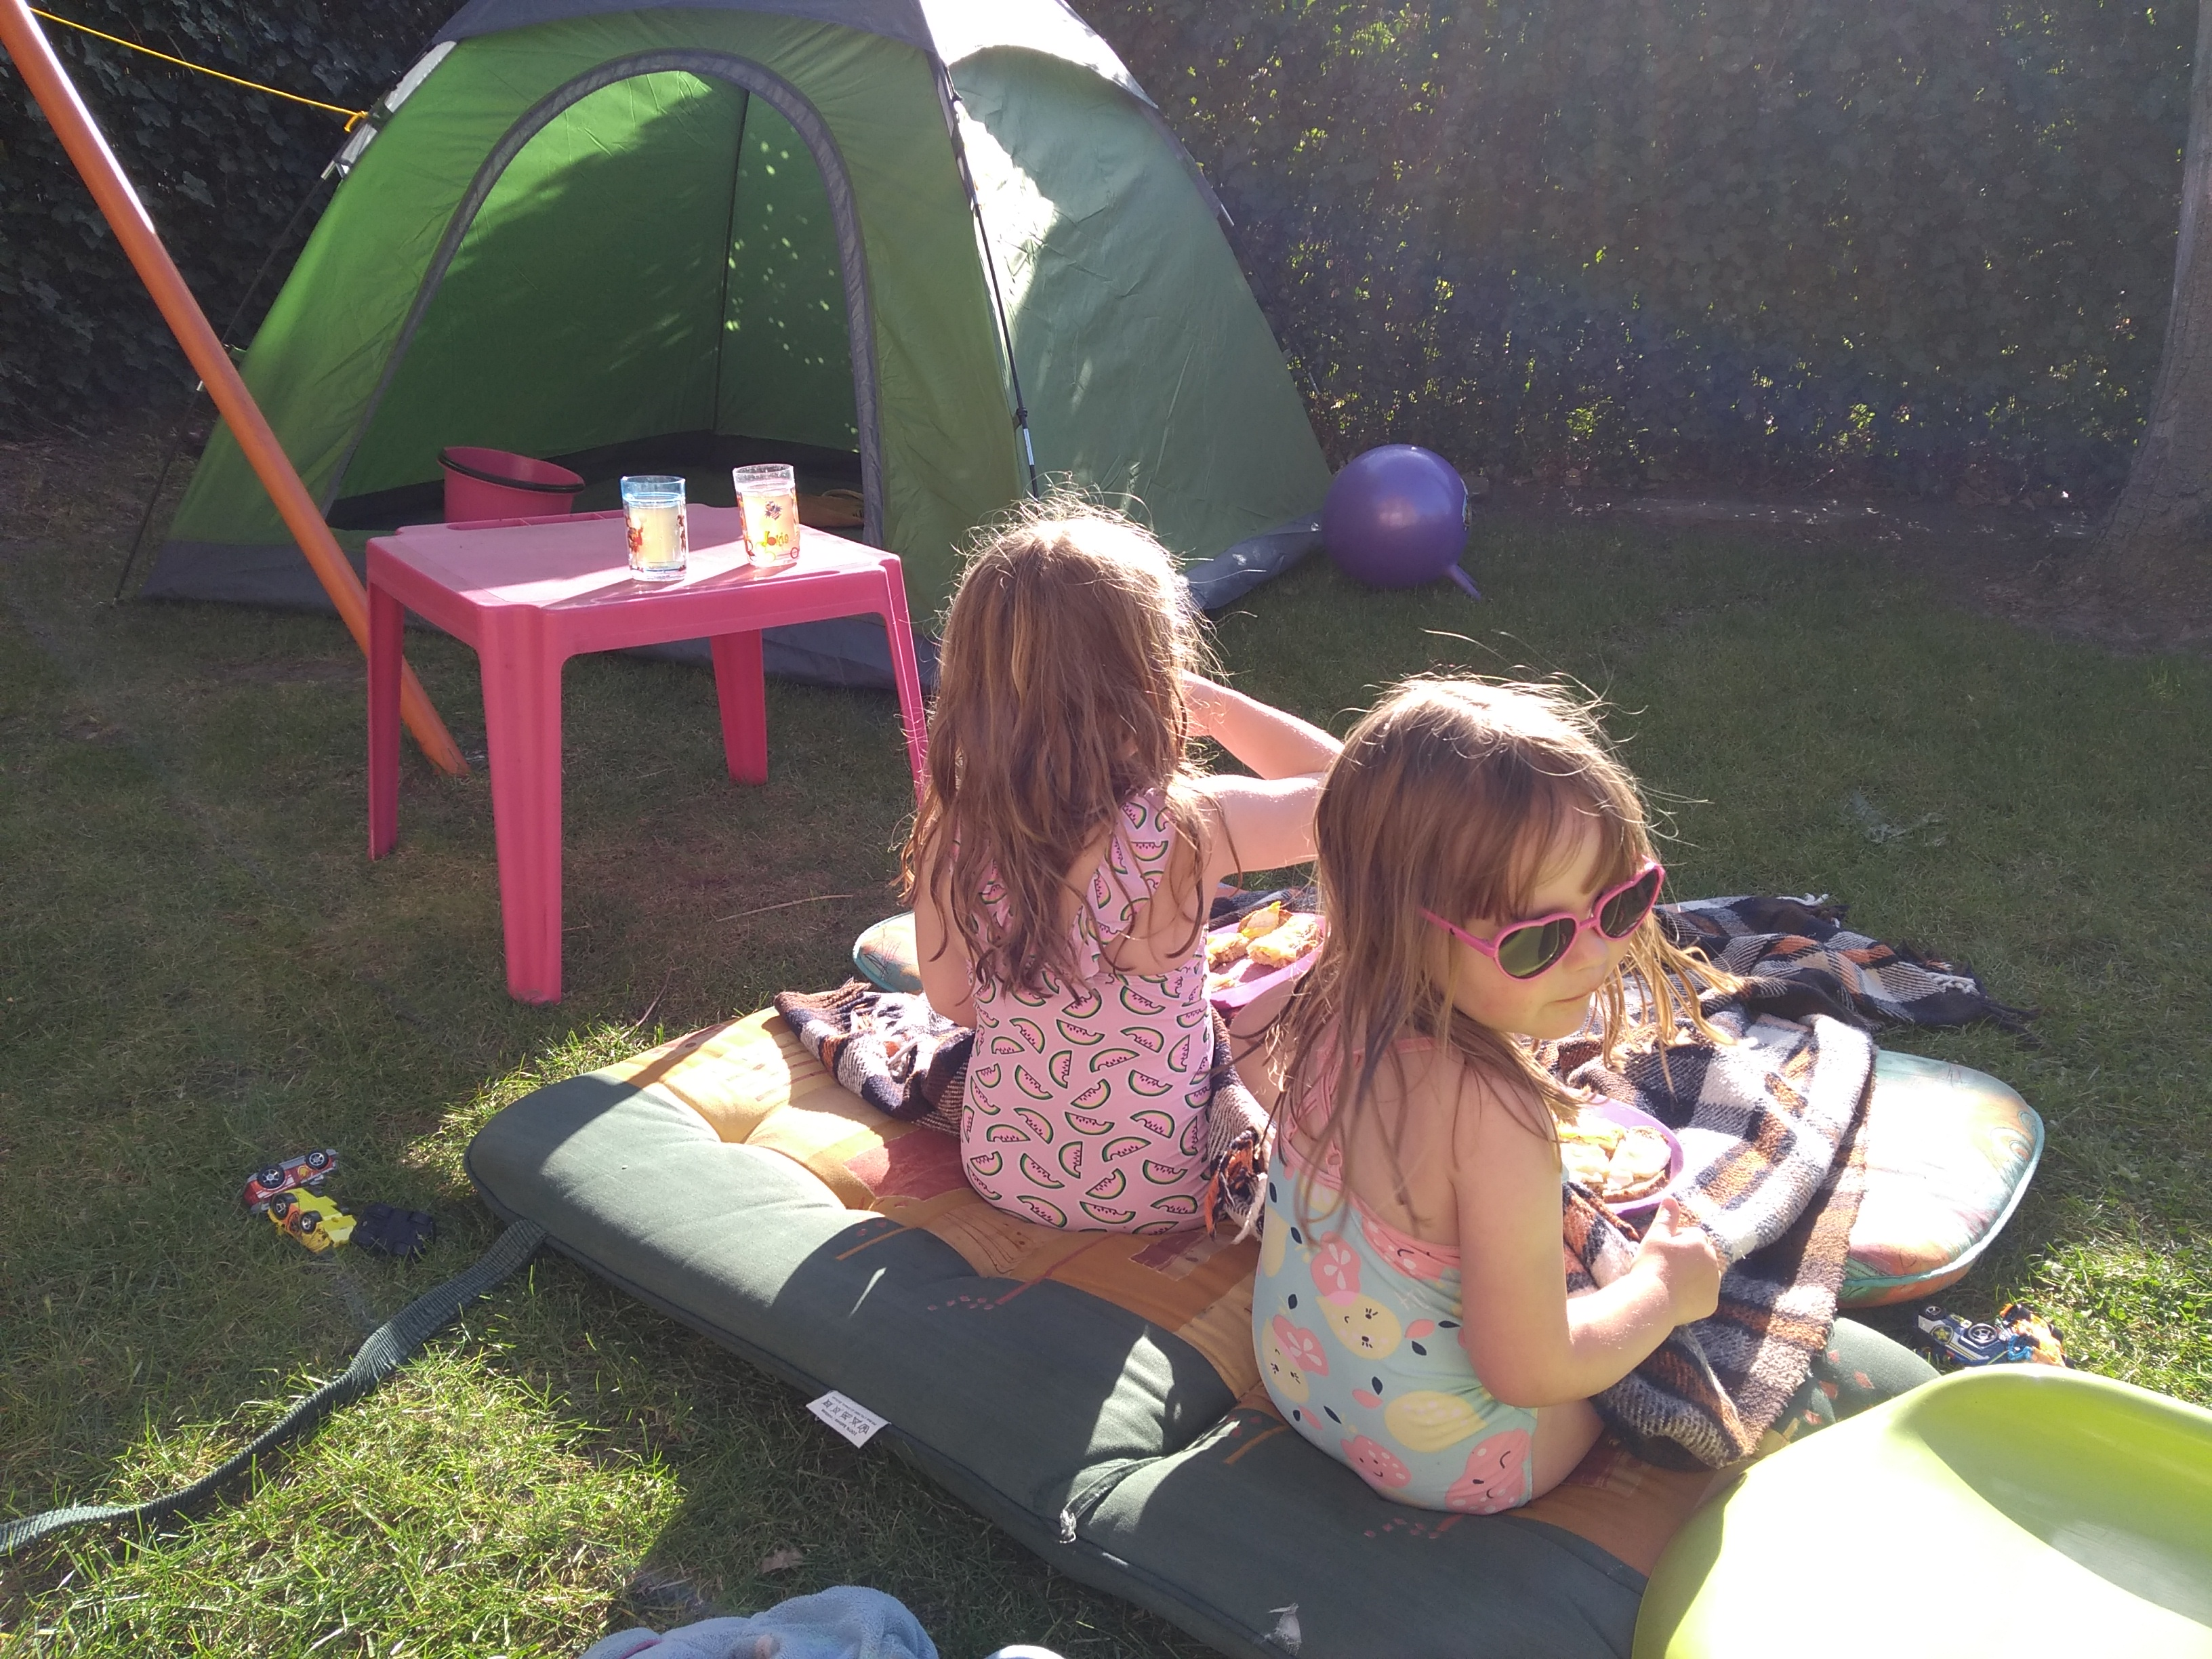 vakantie, zomer, achtertuin, zon, zomervakantie, coronacrisis, lockdown, buiten, mamalife, mamalifestyle, mamalifestyleblog, lalogblog, lalog.nl, lalog